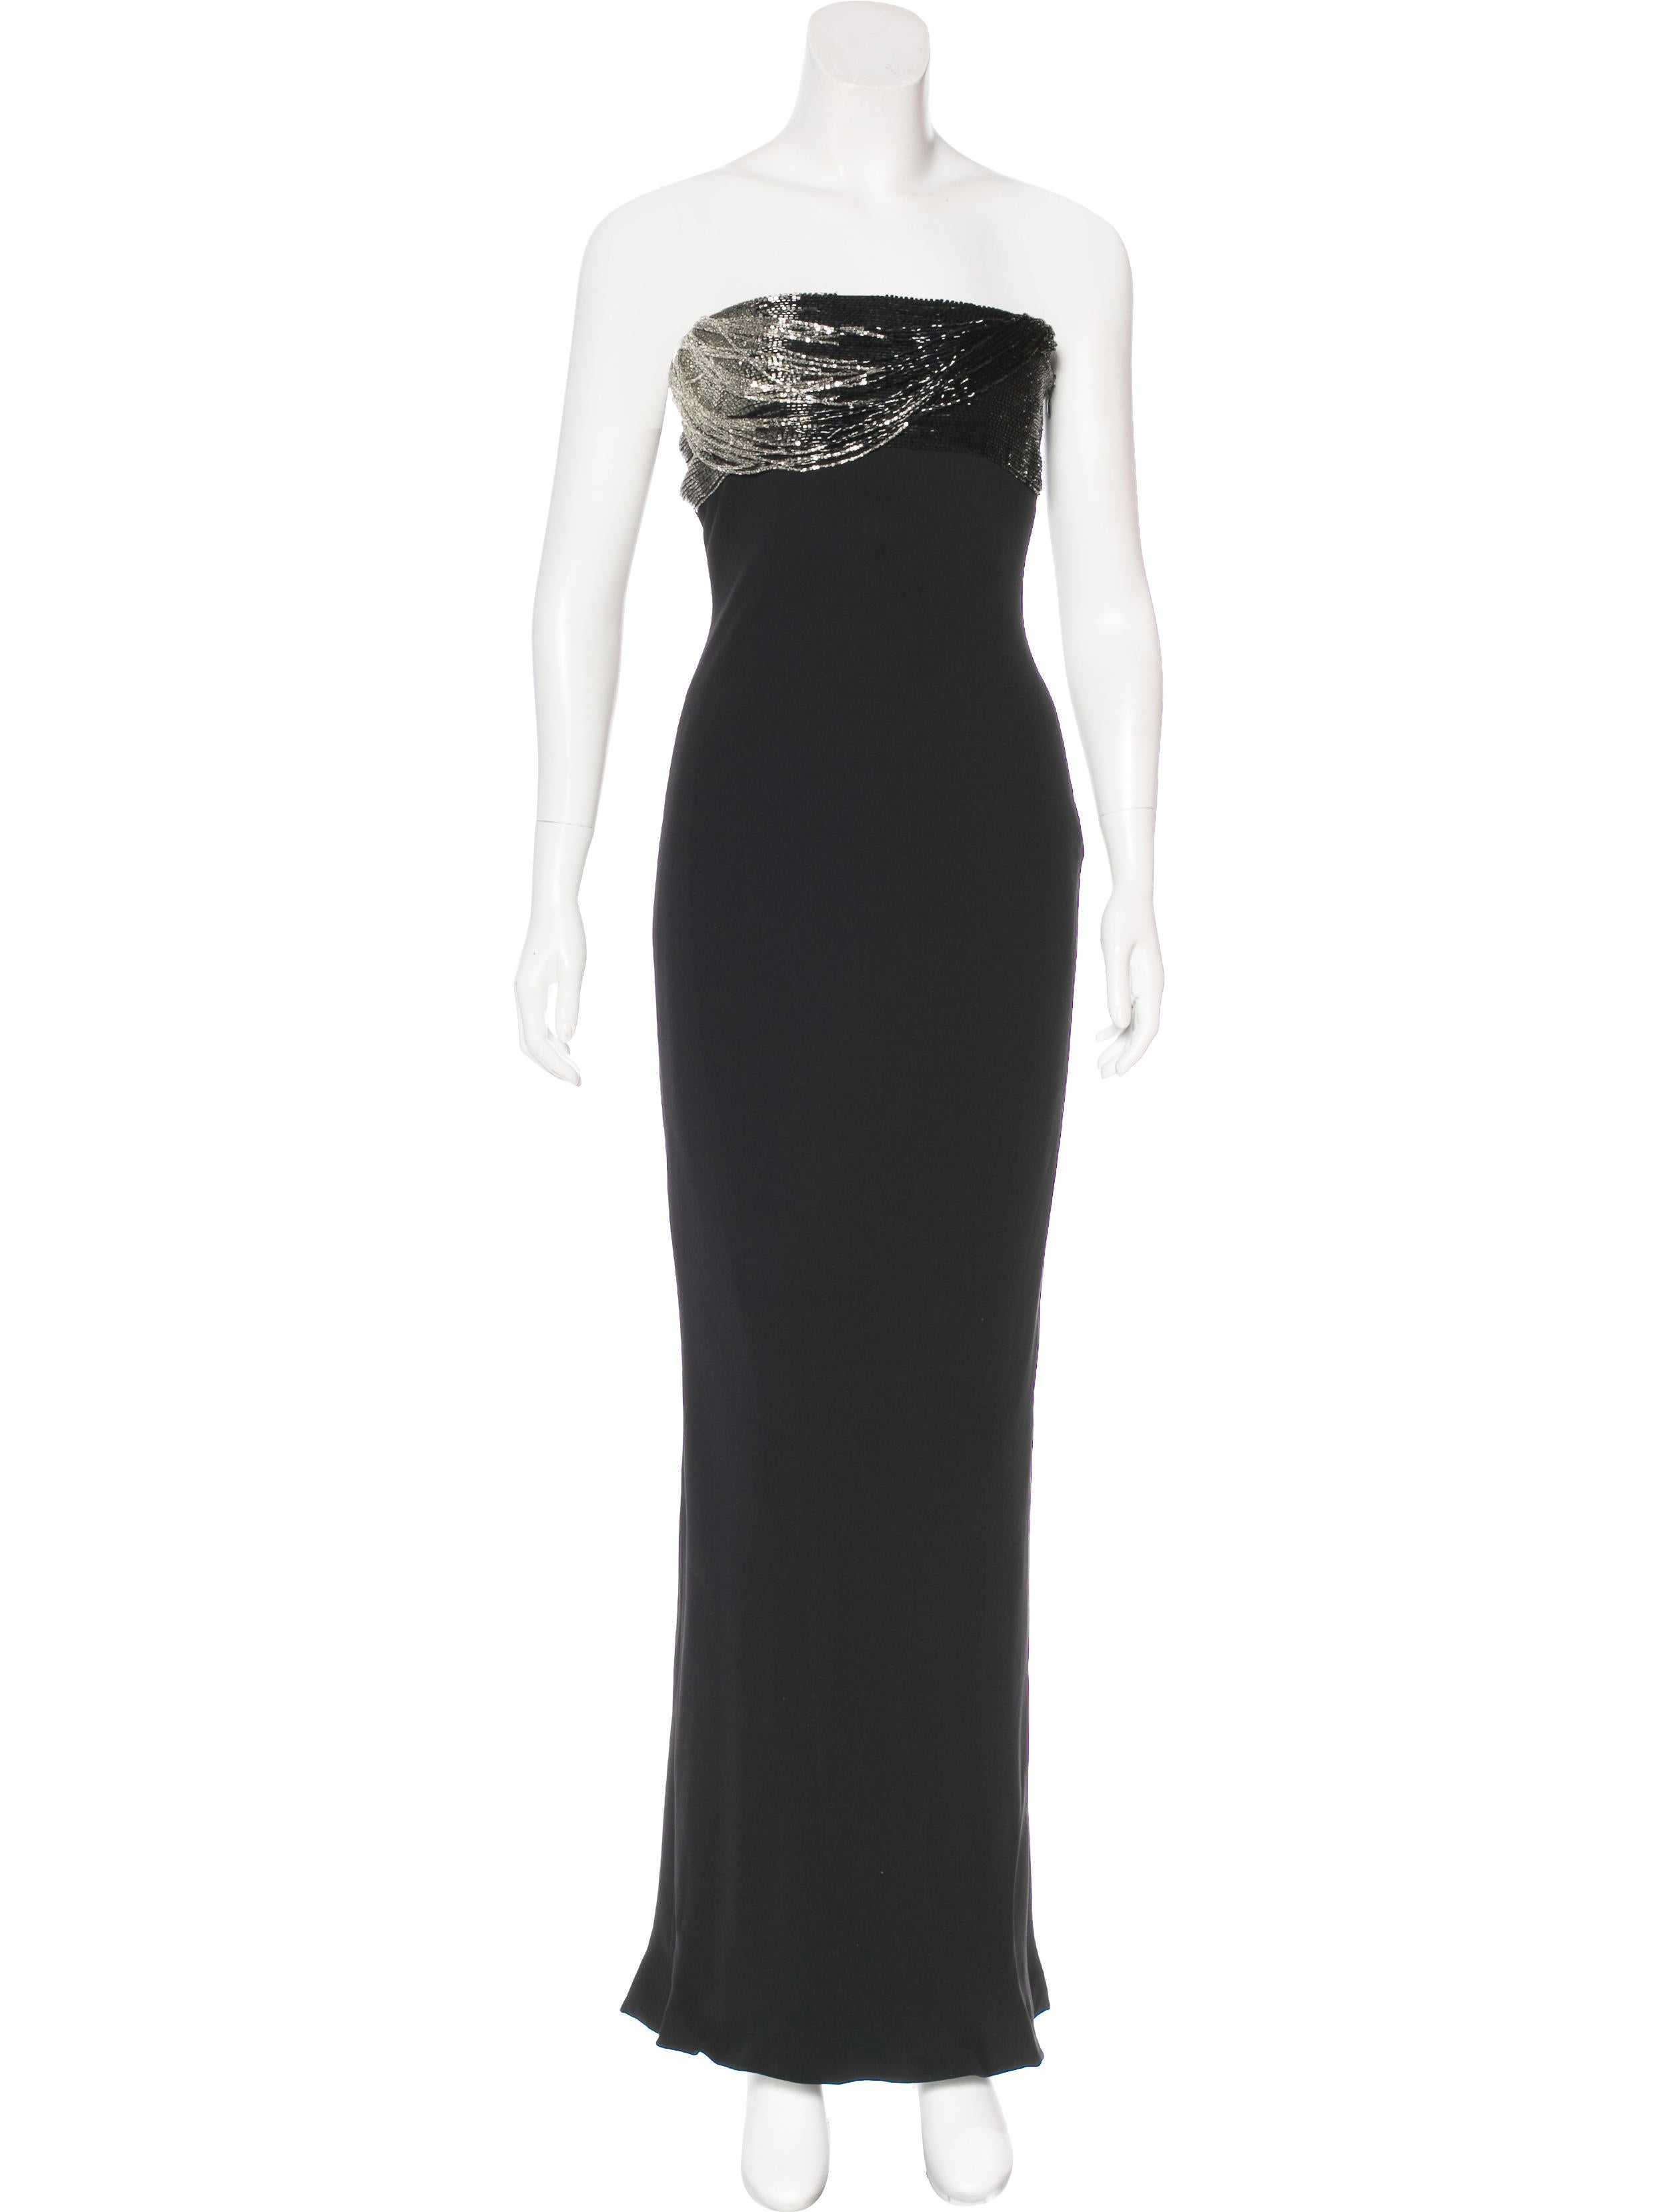 Gianni Versace Beaded Silk Evening Dress - Clothing - GVE20901   The ...